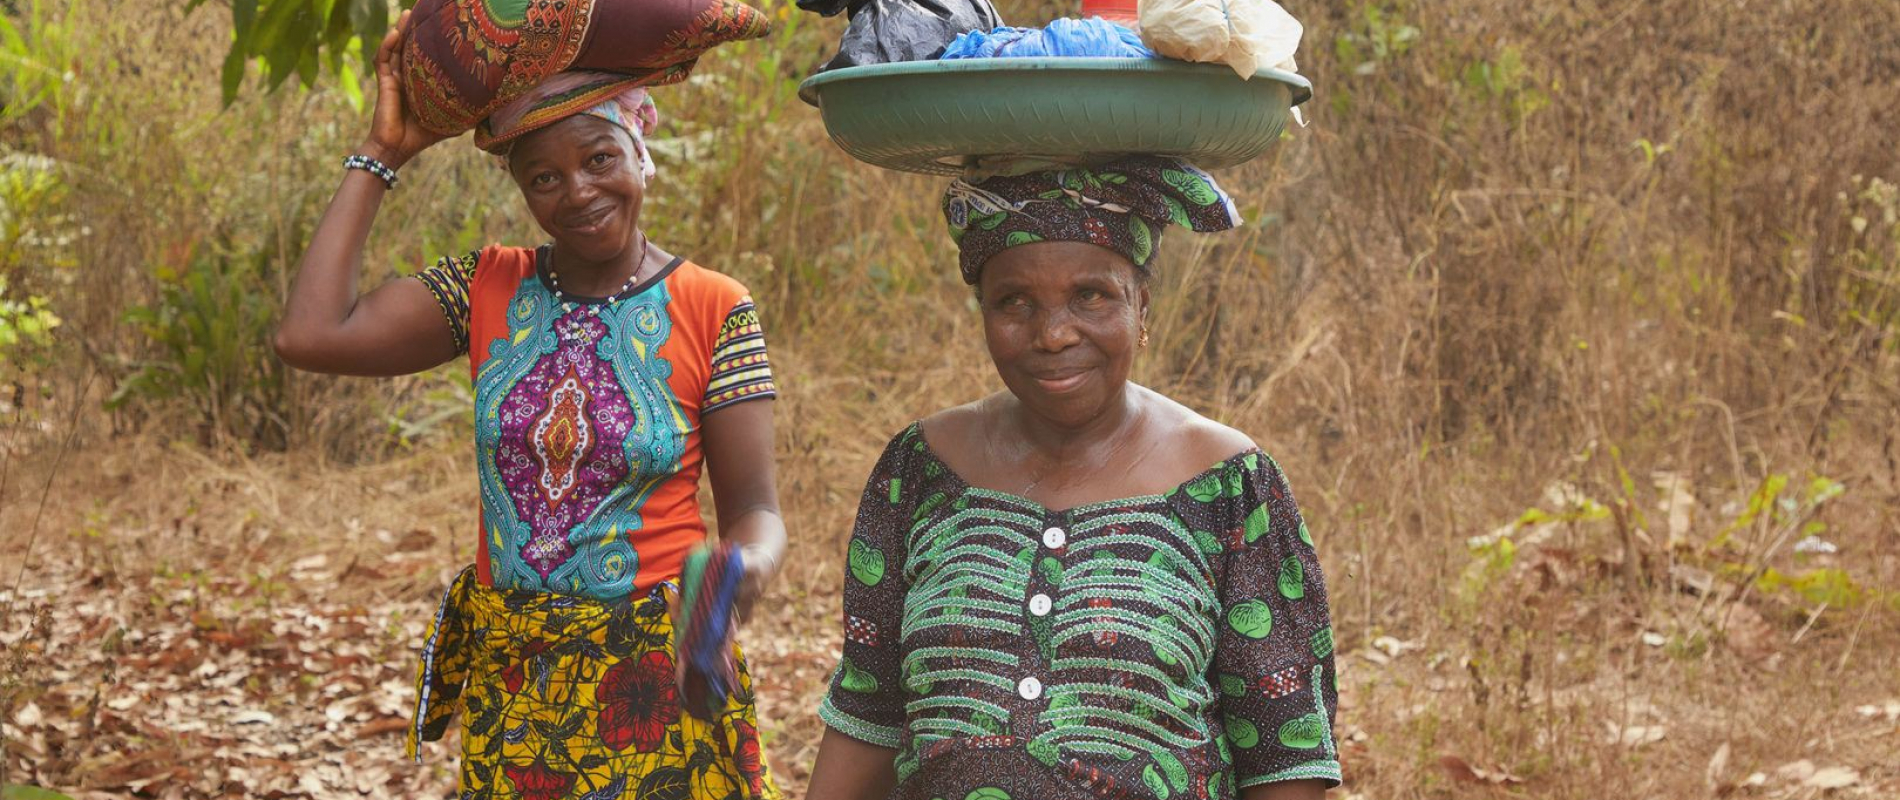 Sierra Leone Madigba community Cashew tuinen Foto Jaco Klamer 31-1-2020